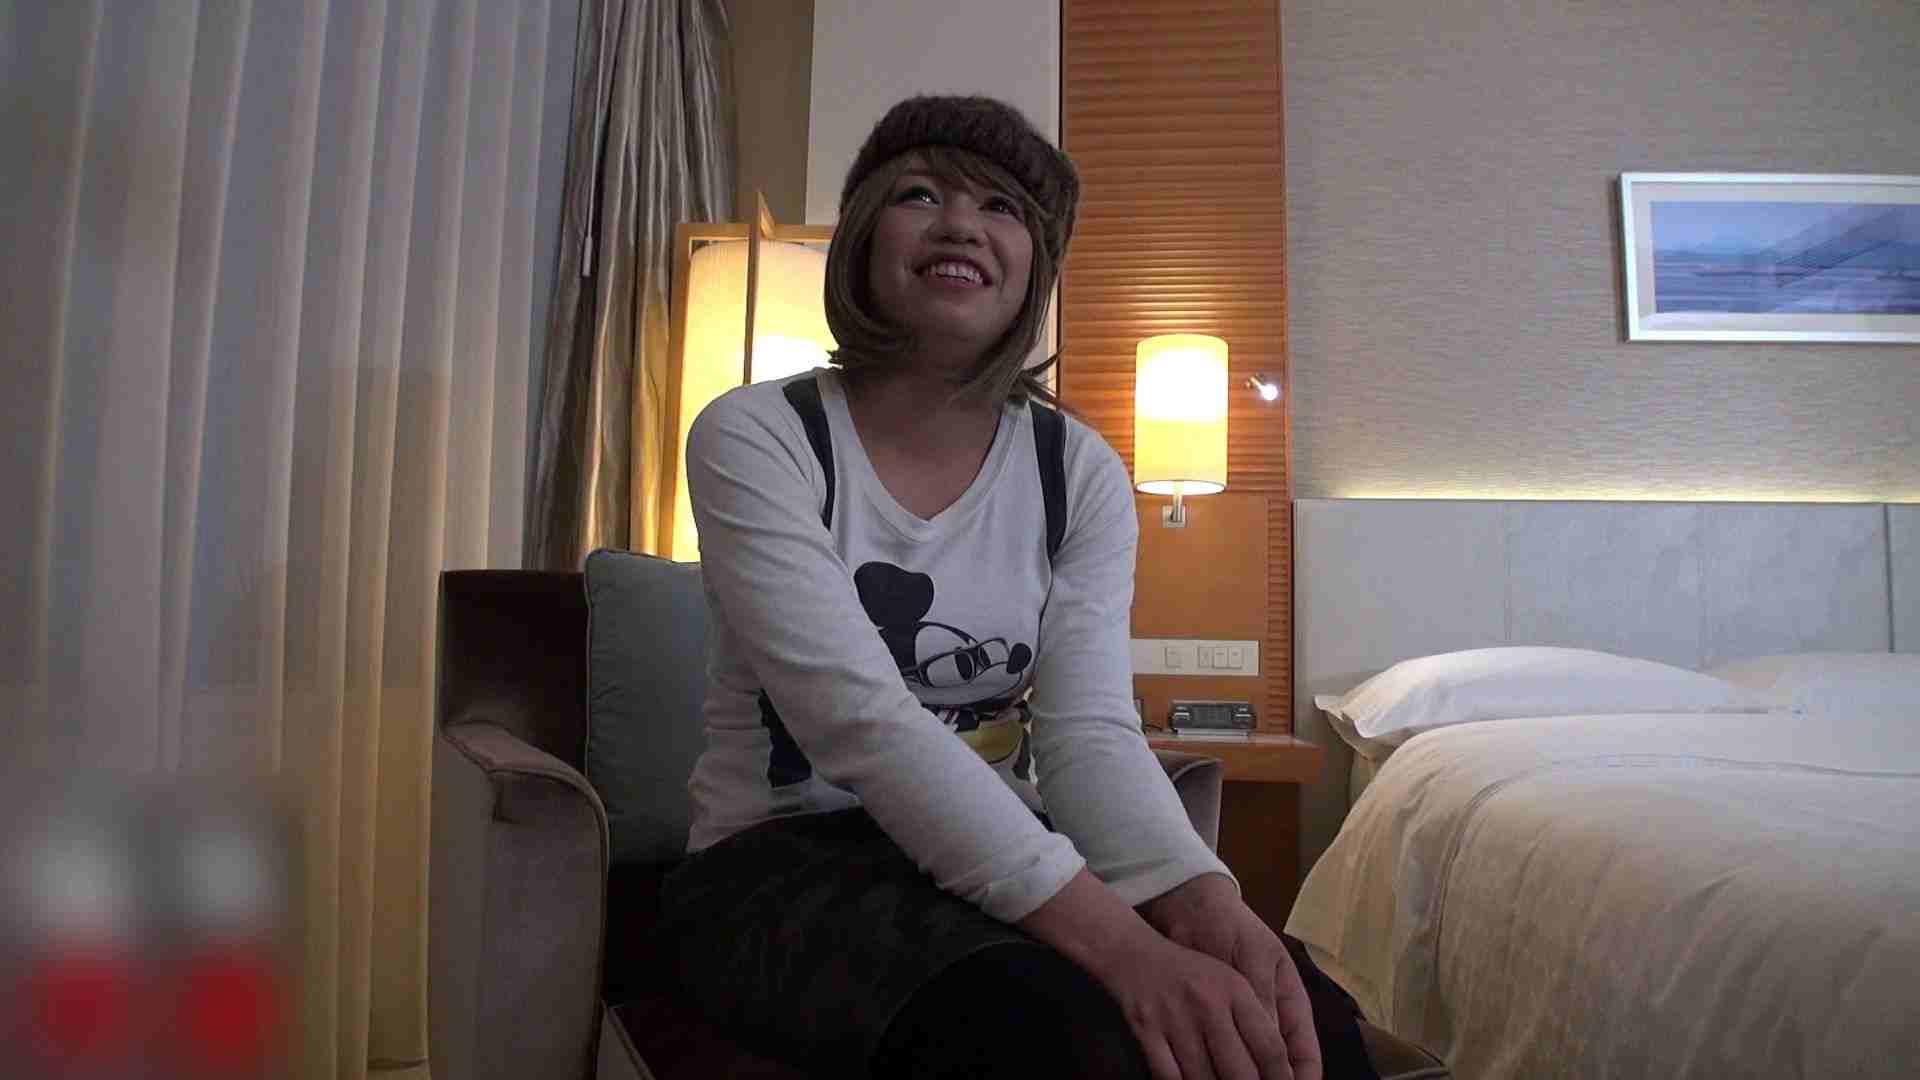 S級厳選美女ビッチガールVol.42 前編 S級美女ギャル 性交動画流出 83画像 28